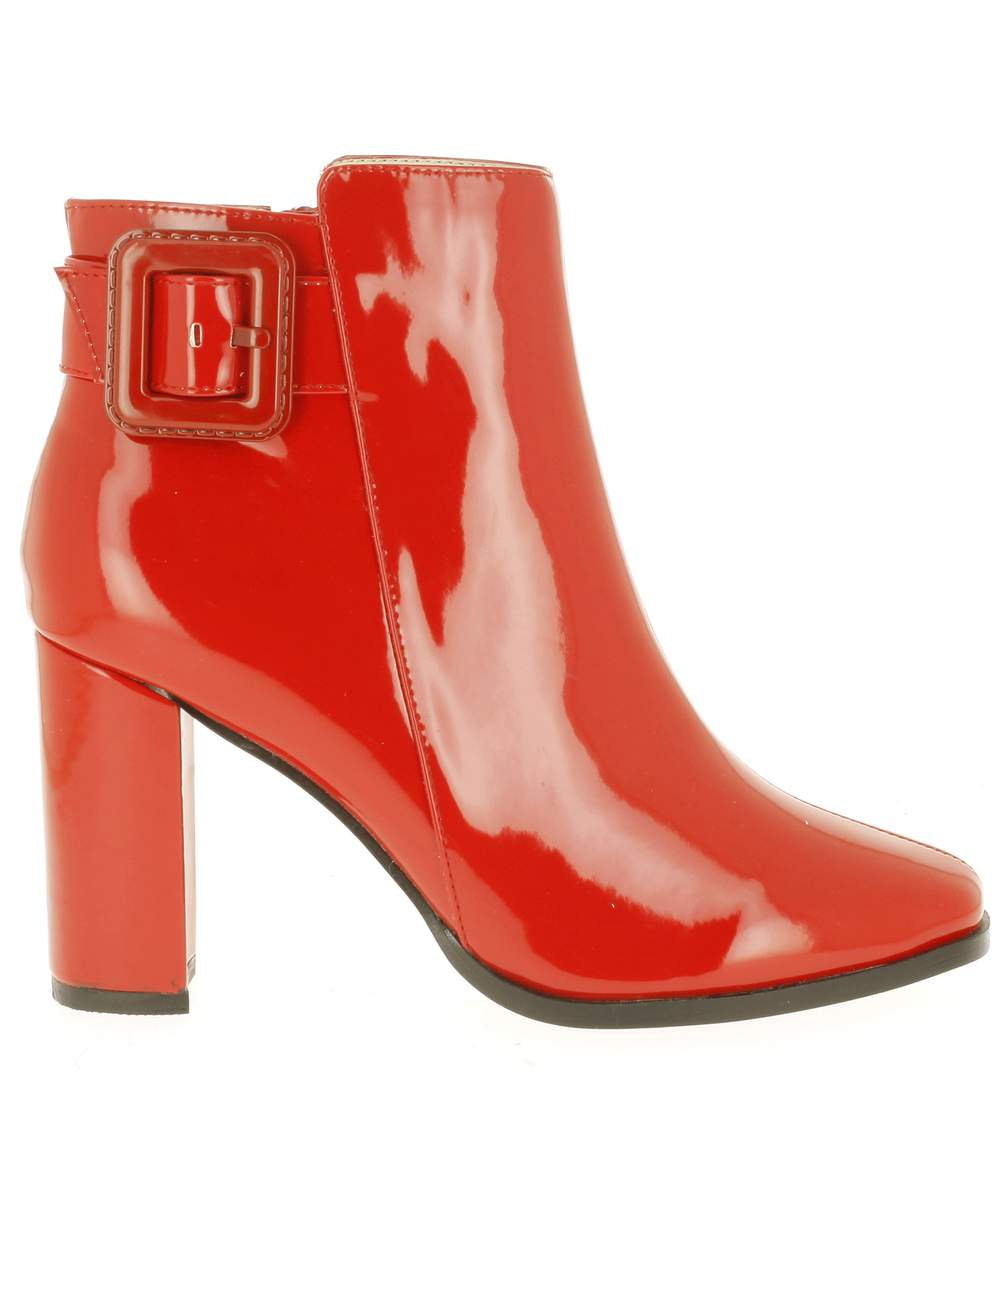 La boots disco